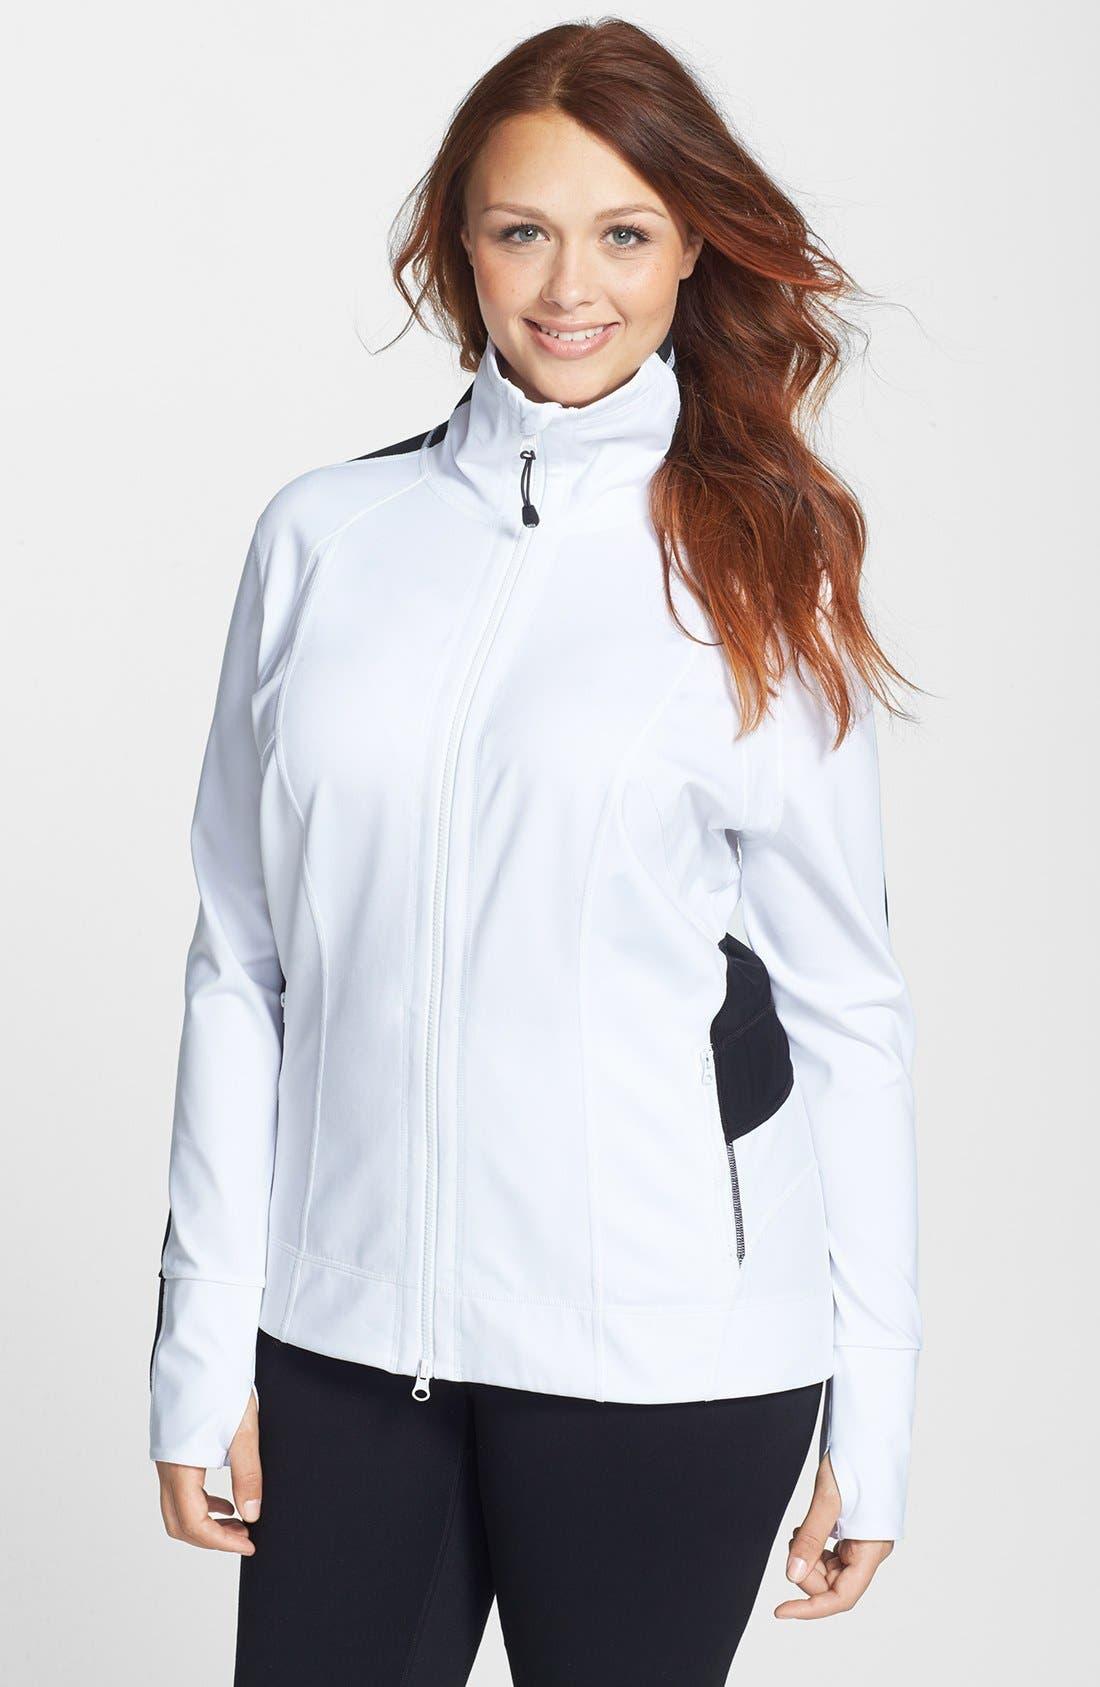 Main Image - Zella 'Bliss' Colorblock Jacket (Plus Size)